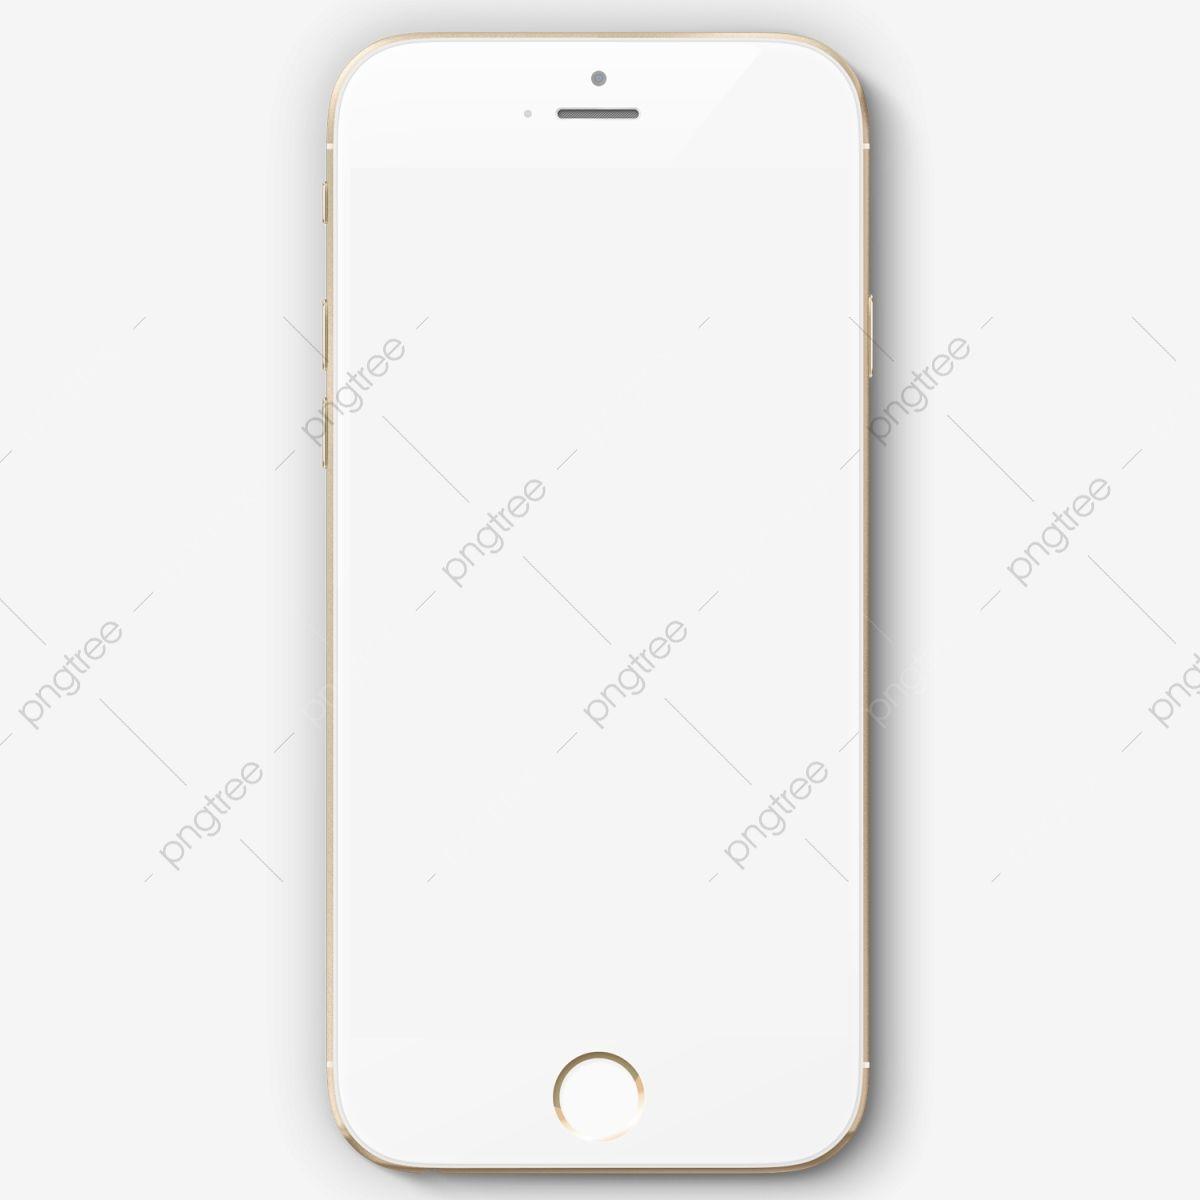 Iphone 8 Mockup Premium Iphone Logo Mockups Psd Flyer Template